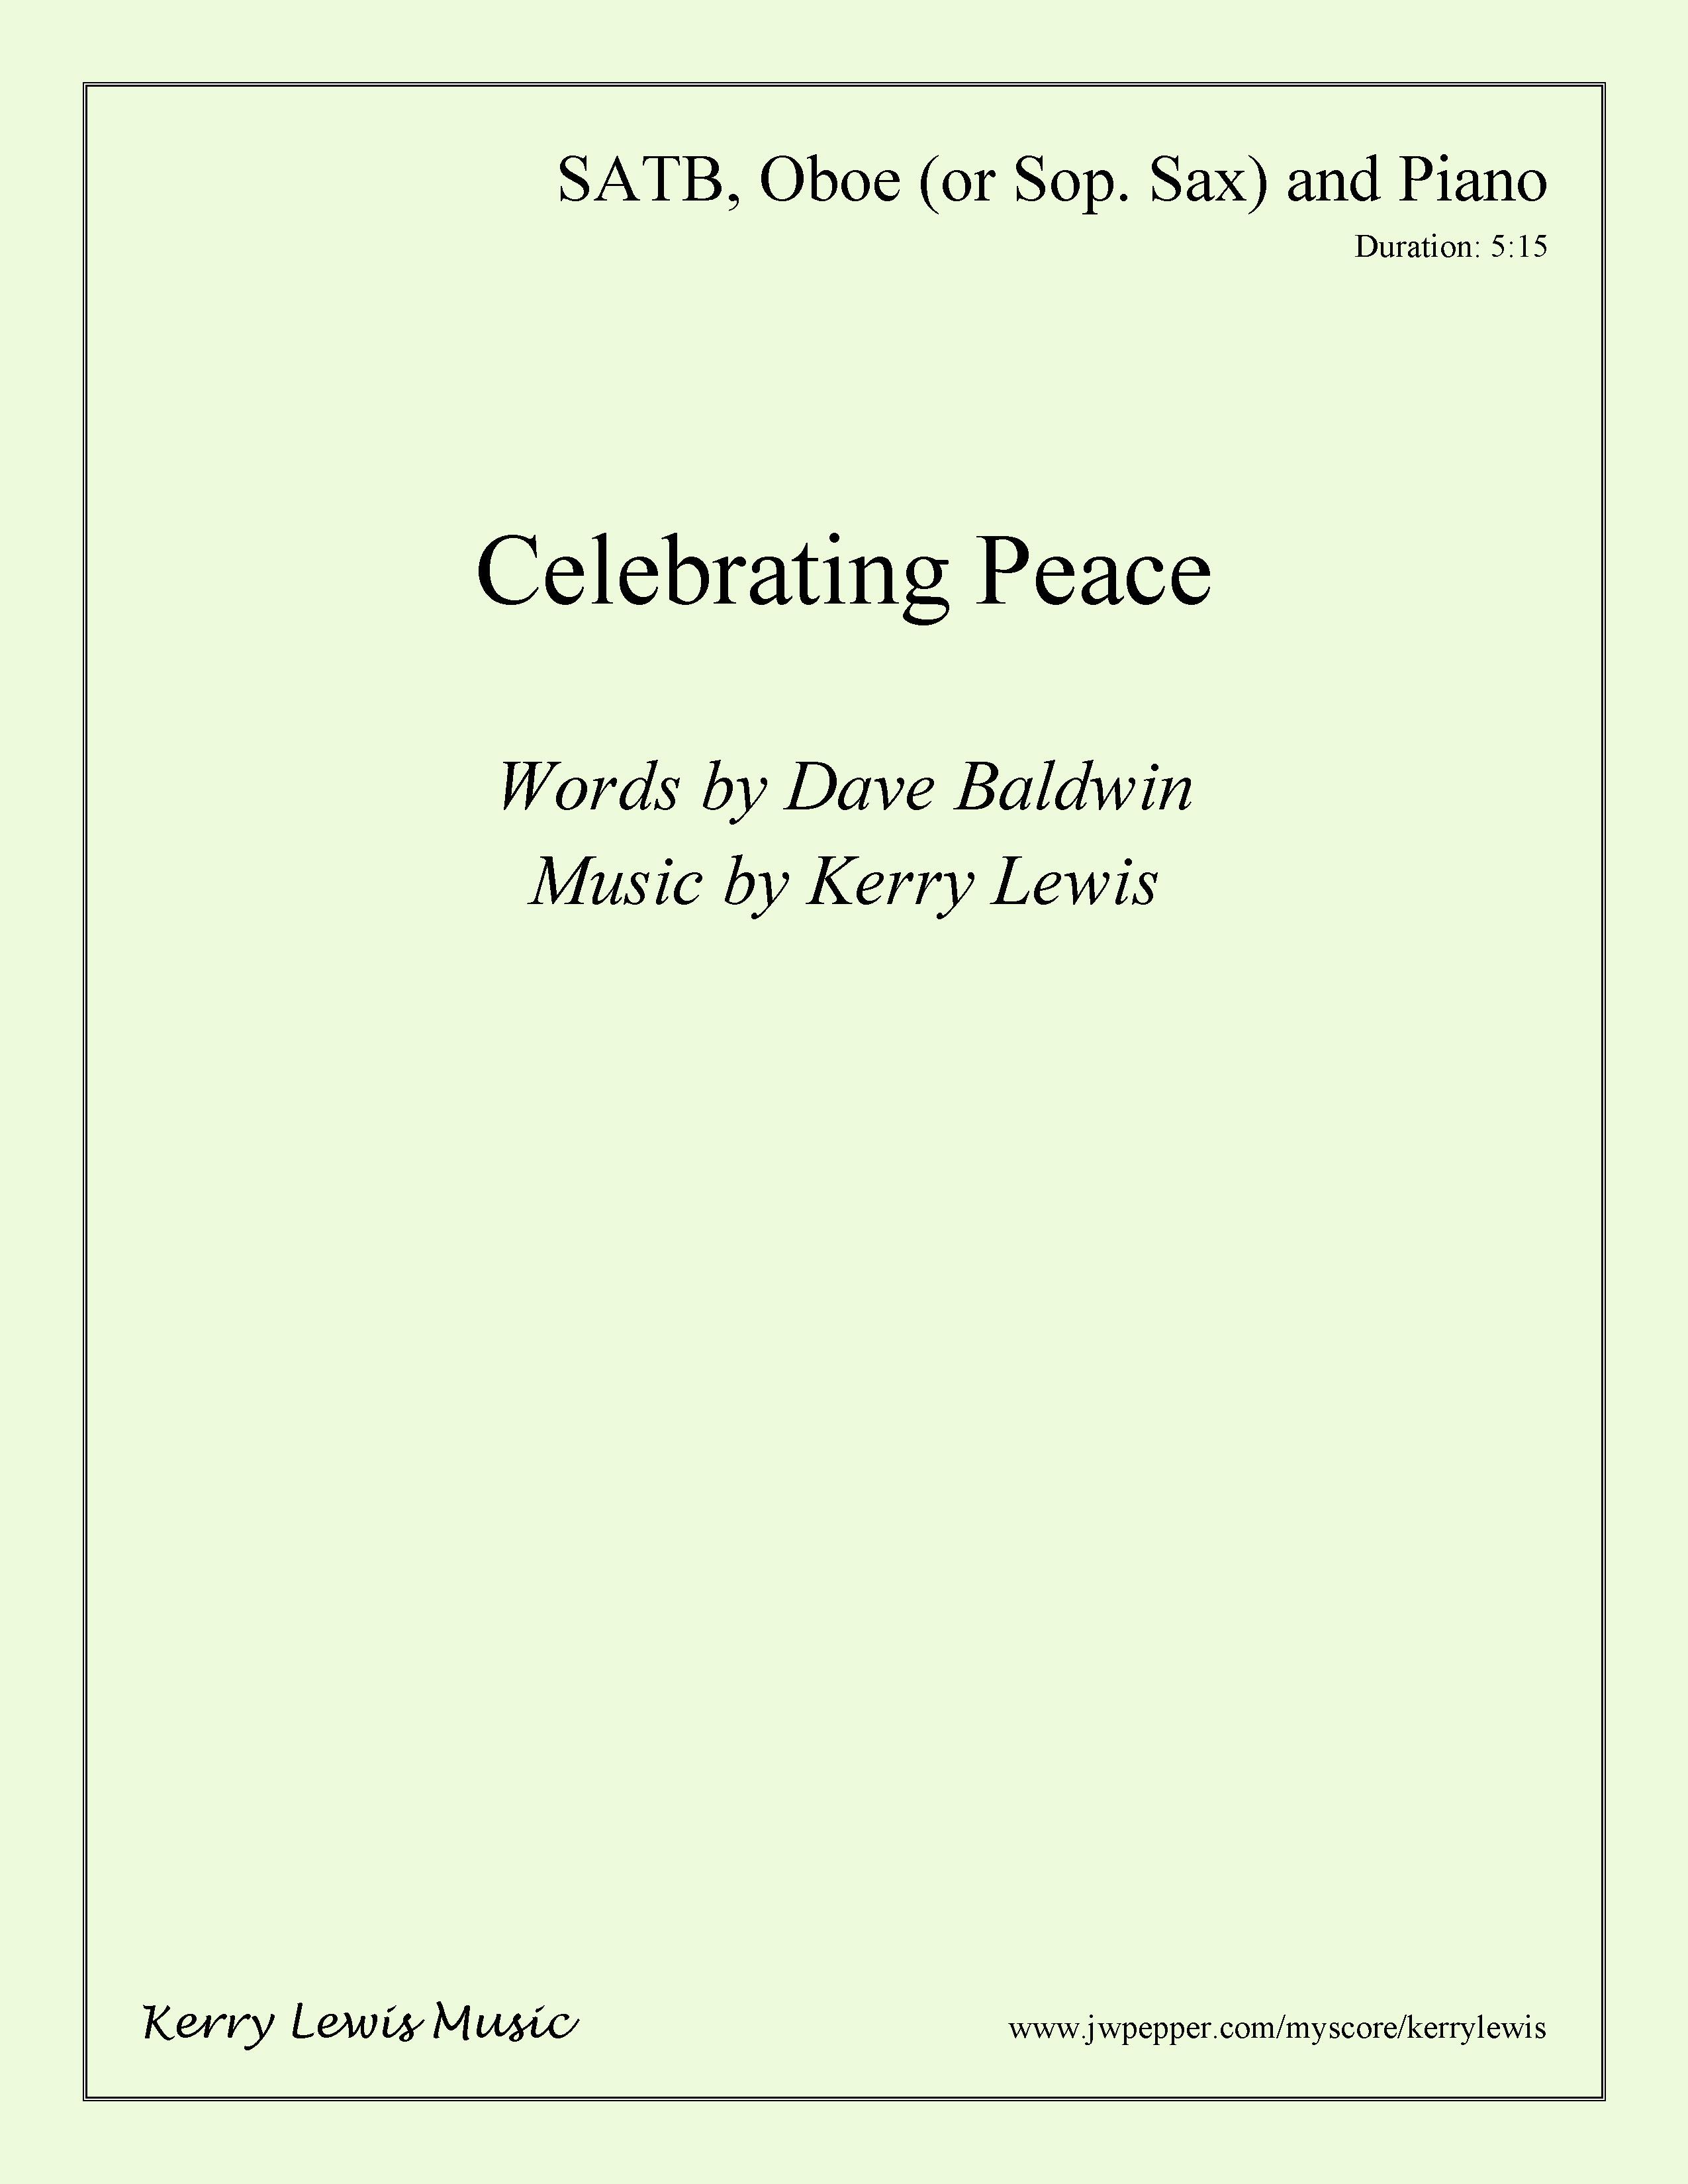 Celebrating Peace